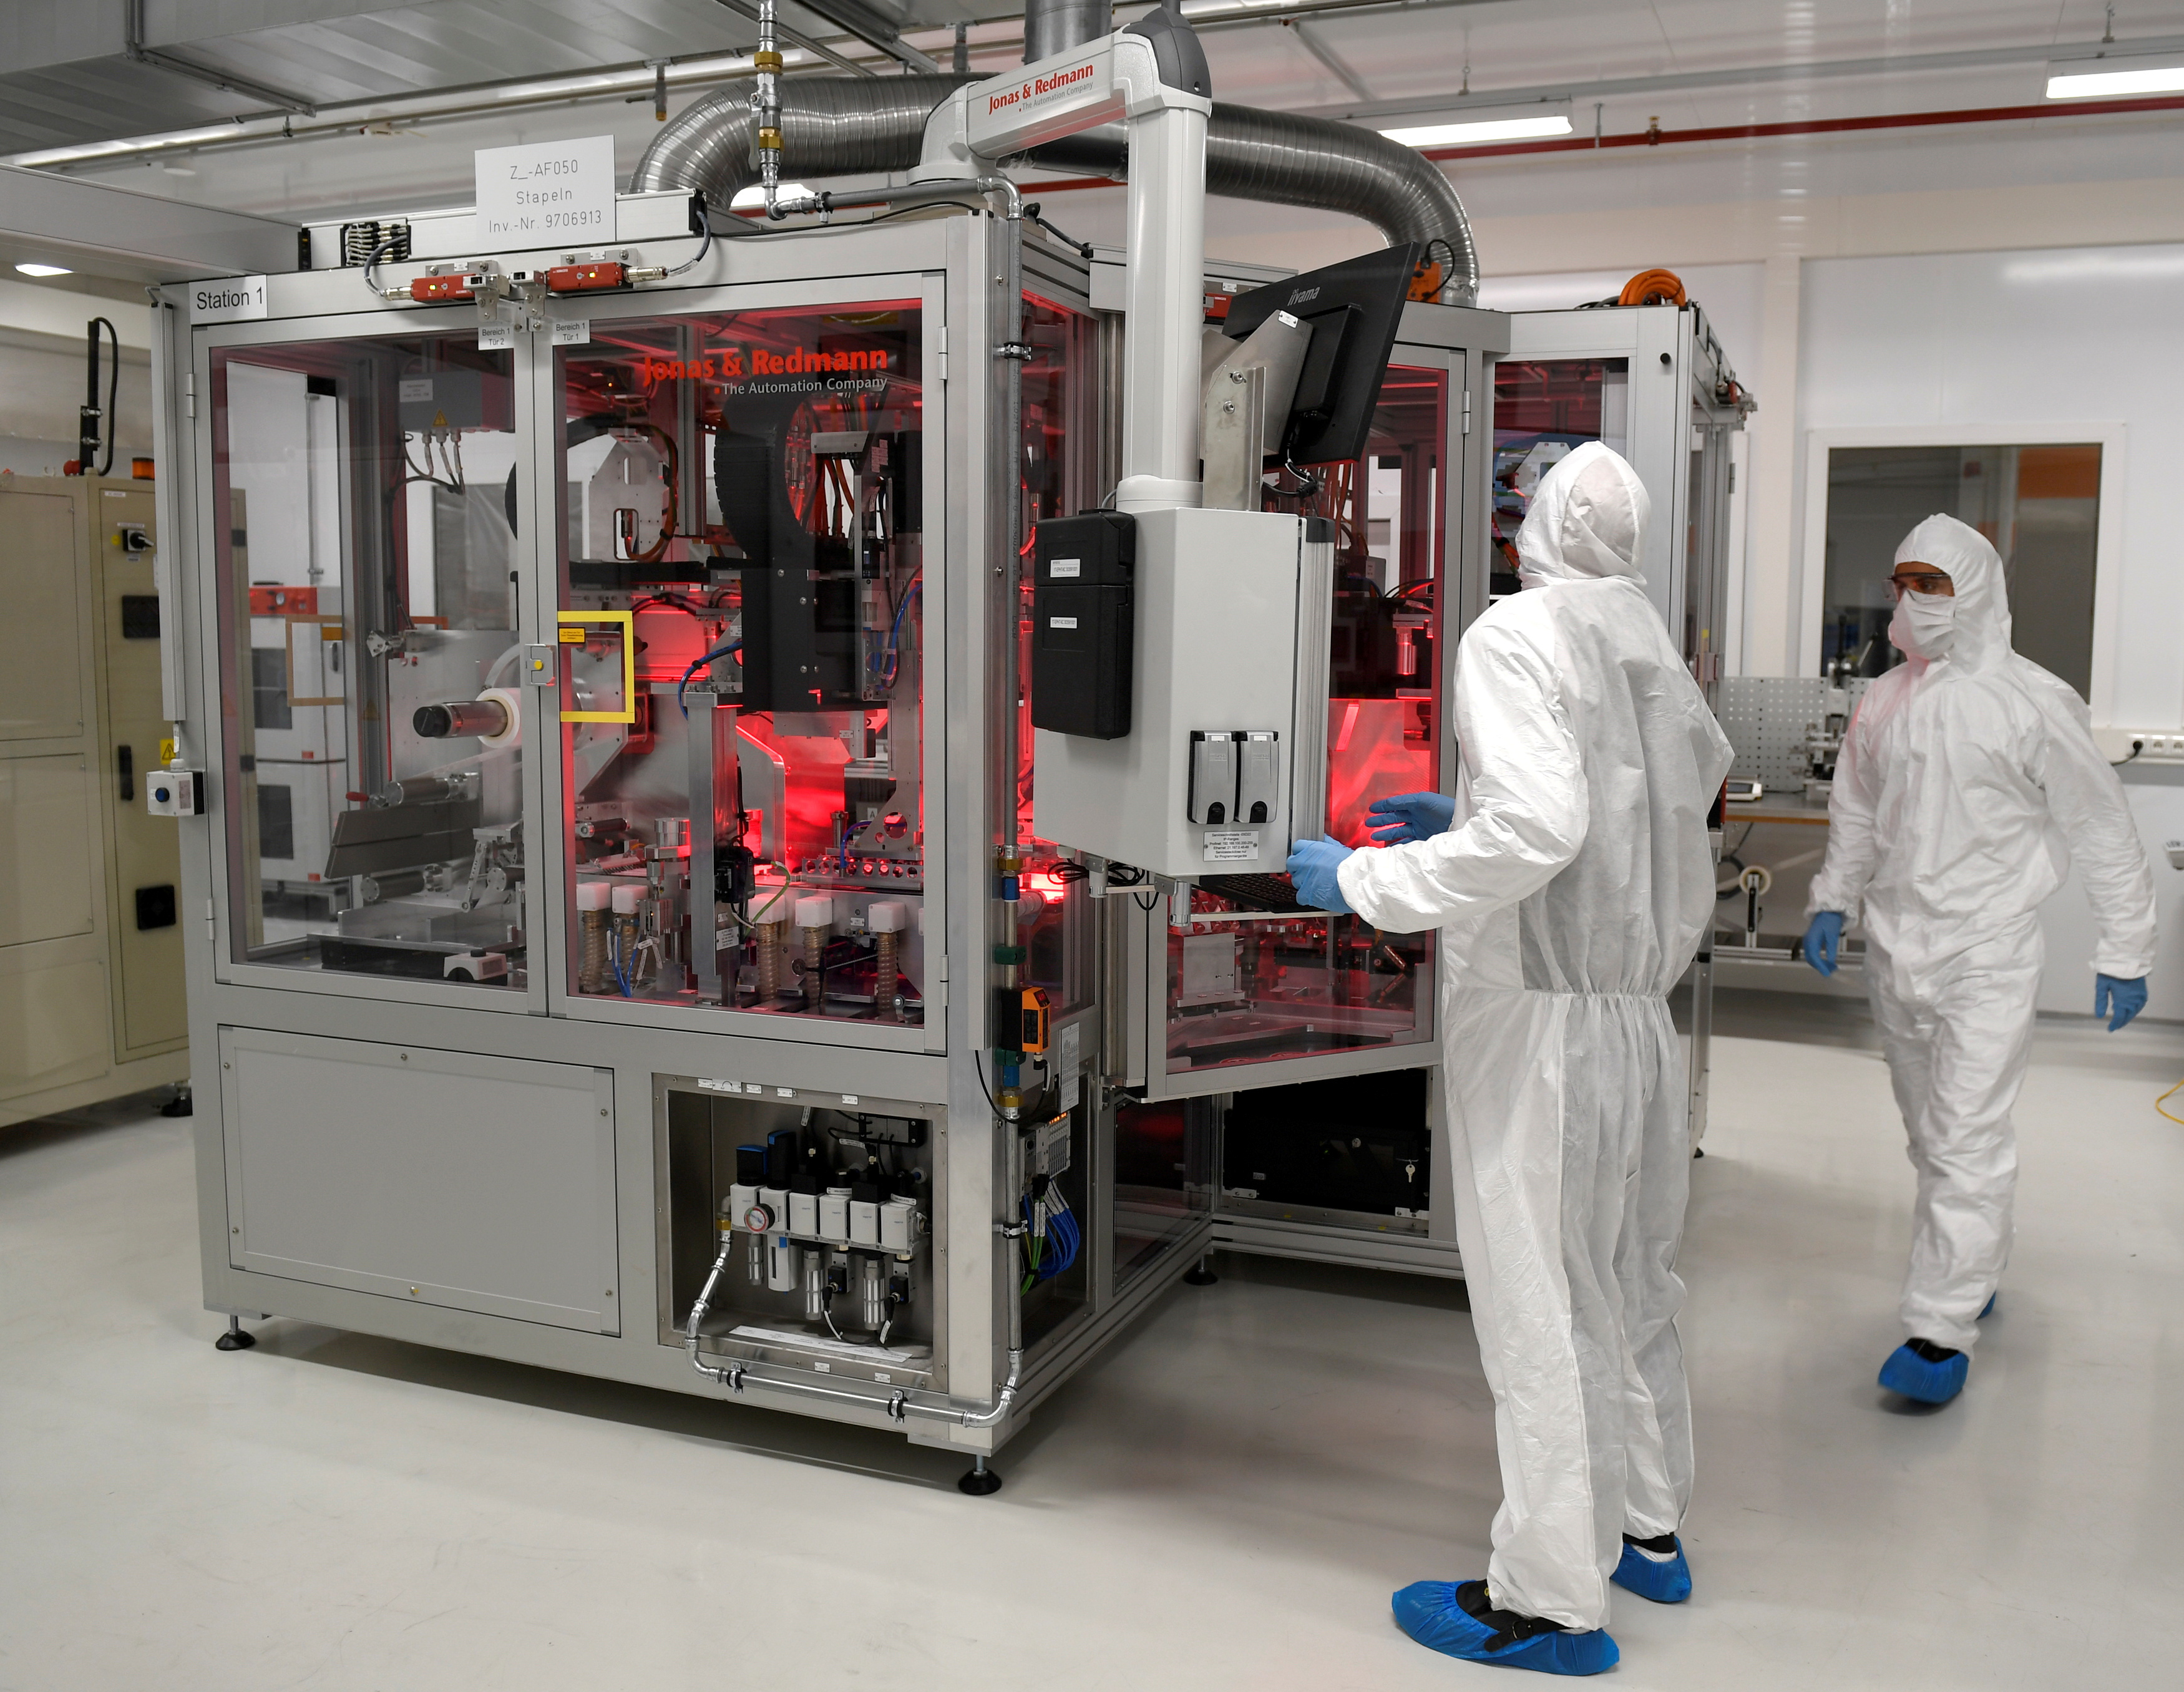 Employees of German carmaker Volkswagen work in a production line of VW' new battery plant in Salzgitter, Germany September 23, 2019. REUTERS/Fabian Bimmer